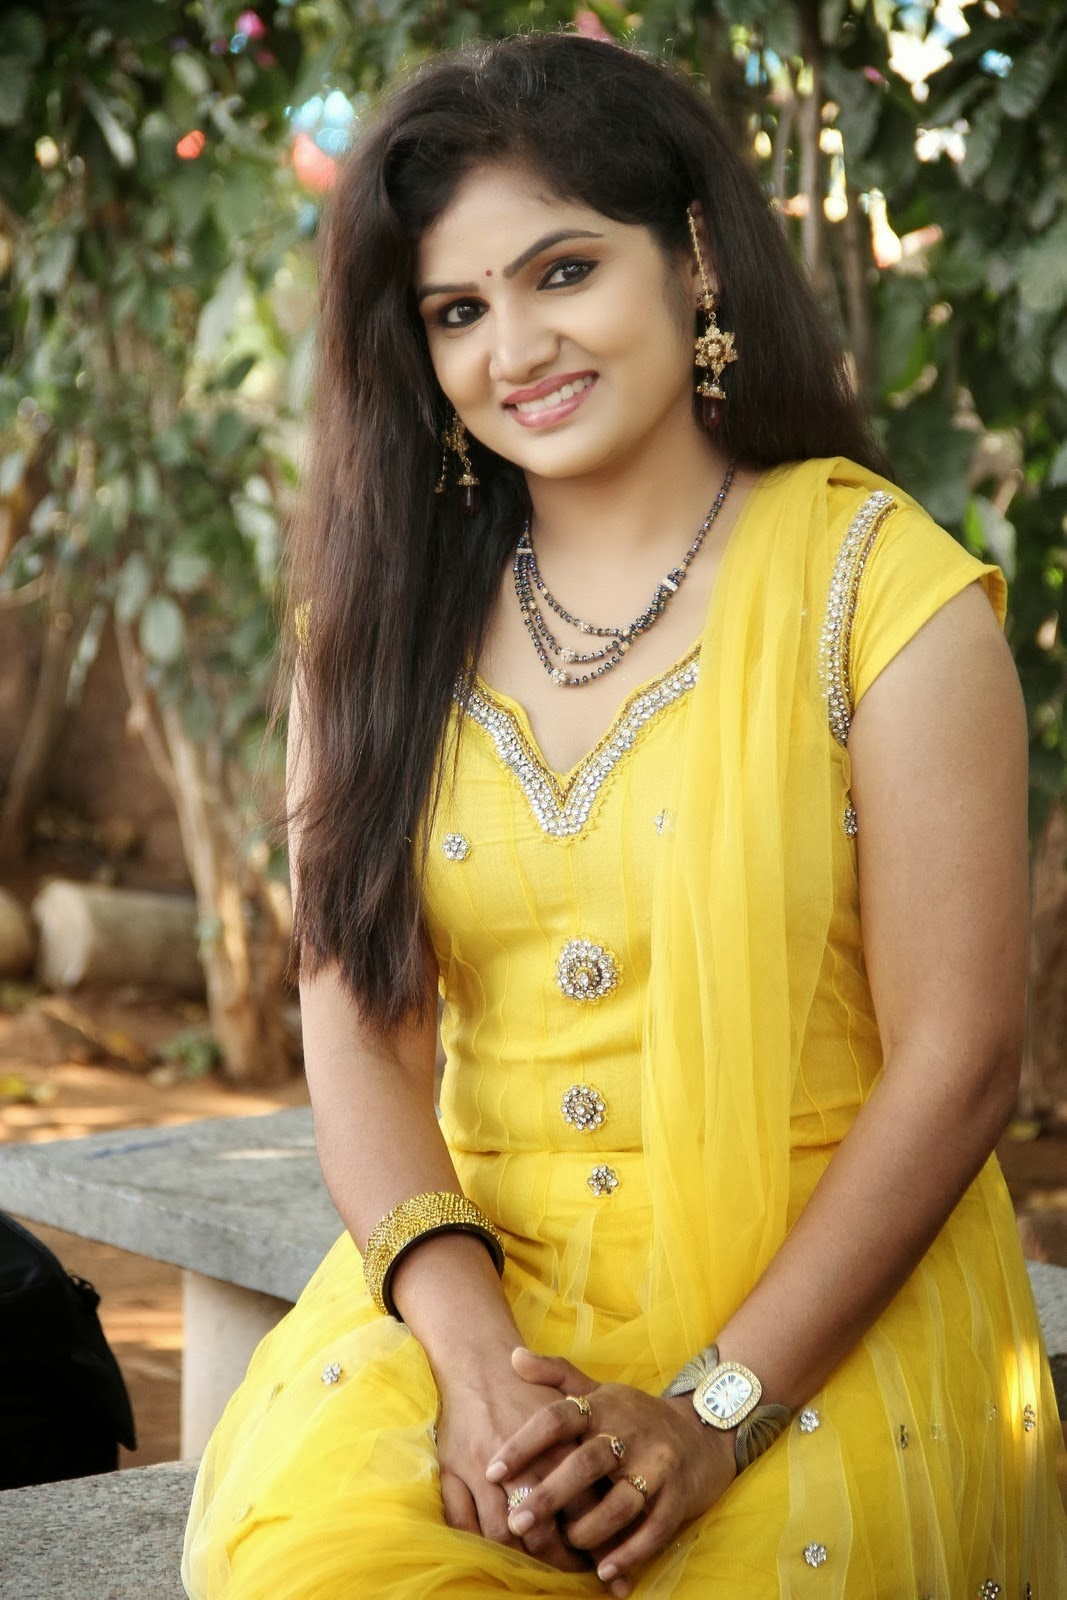 Kerala Cute Girls Photos For Facebook Profile Post -3669